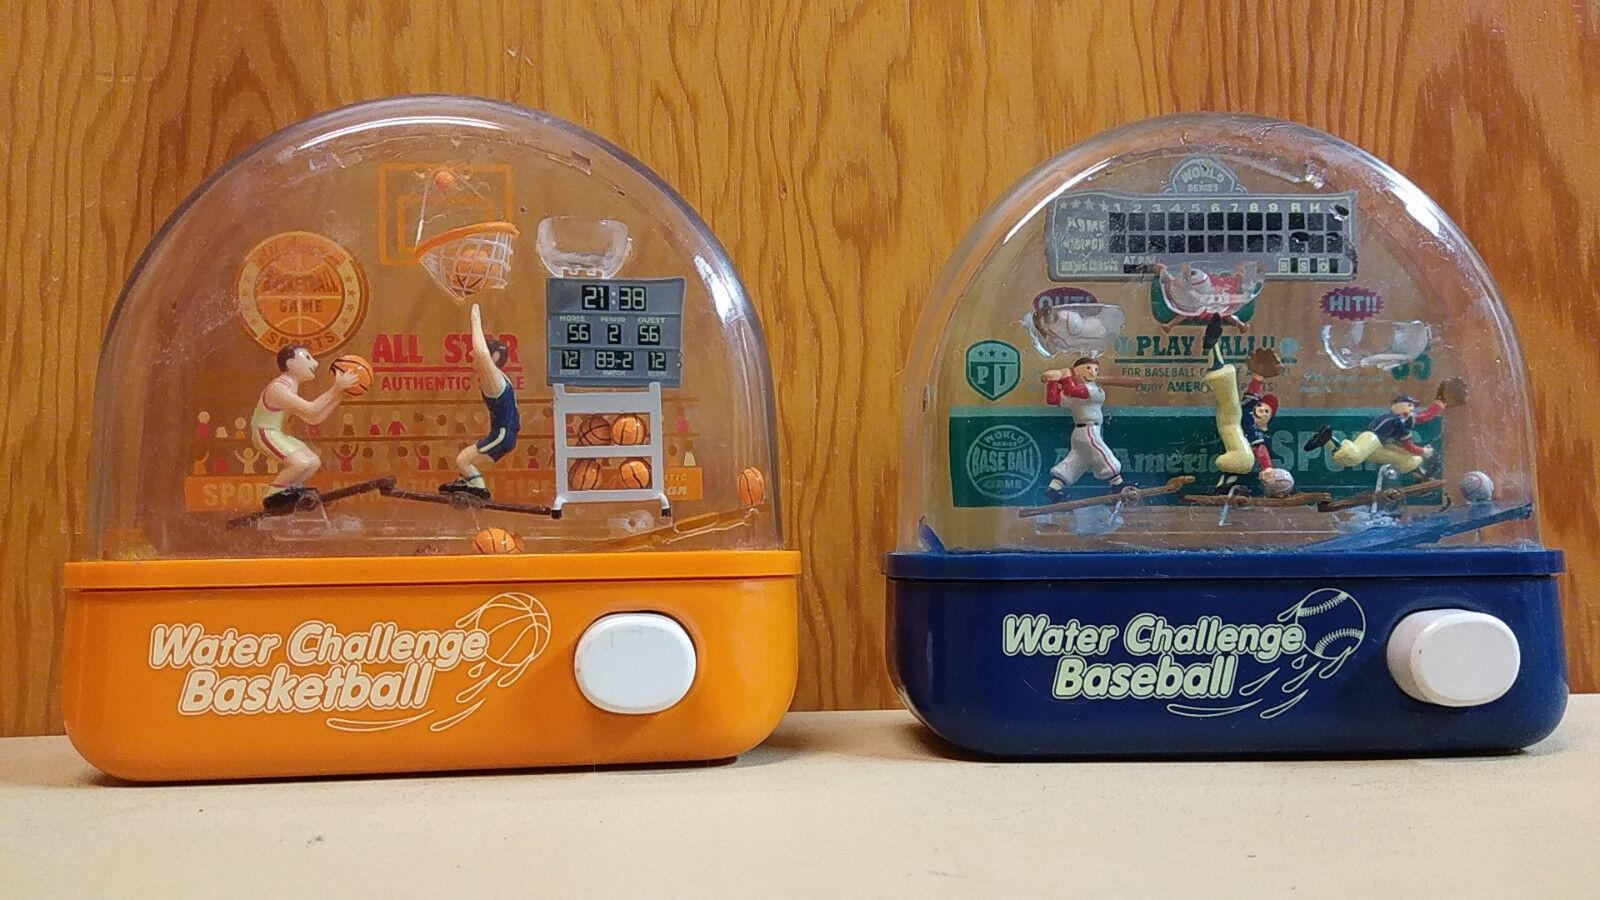 Wasser herausforderung baseball basketball vintage penny japan unternehmen